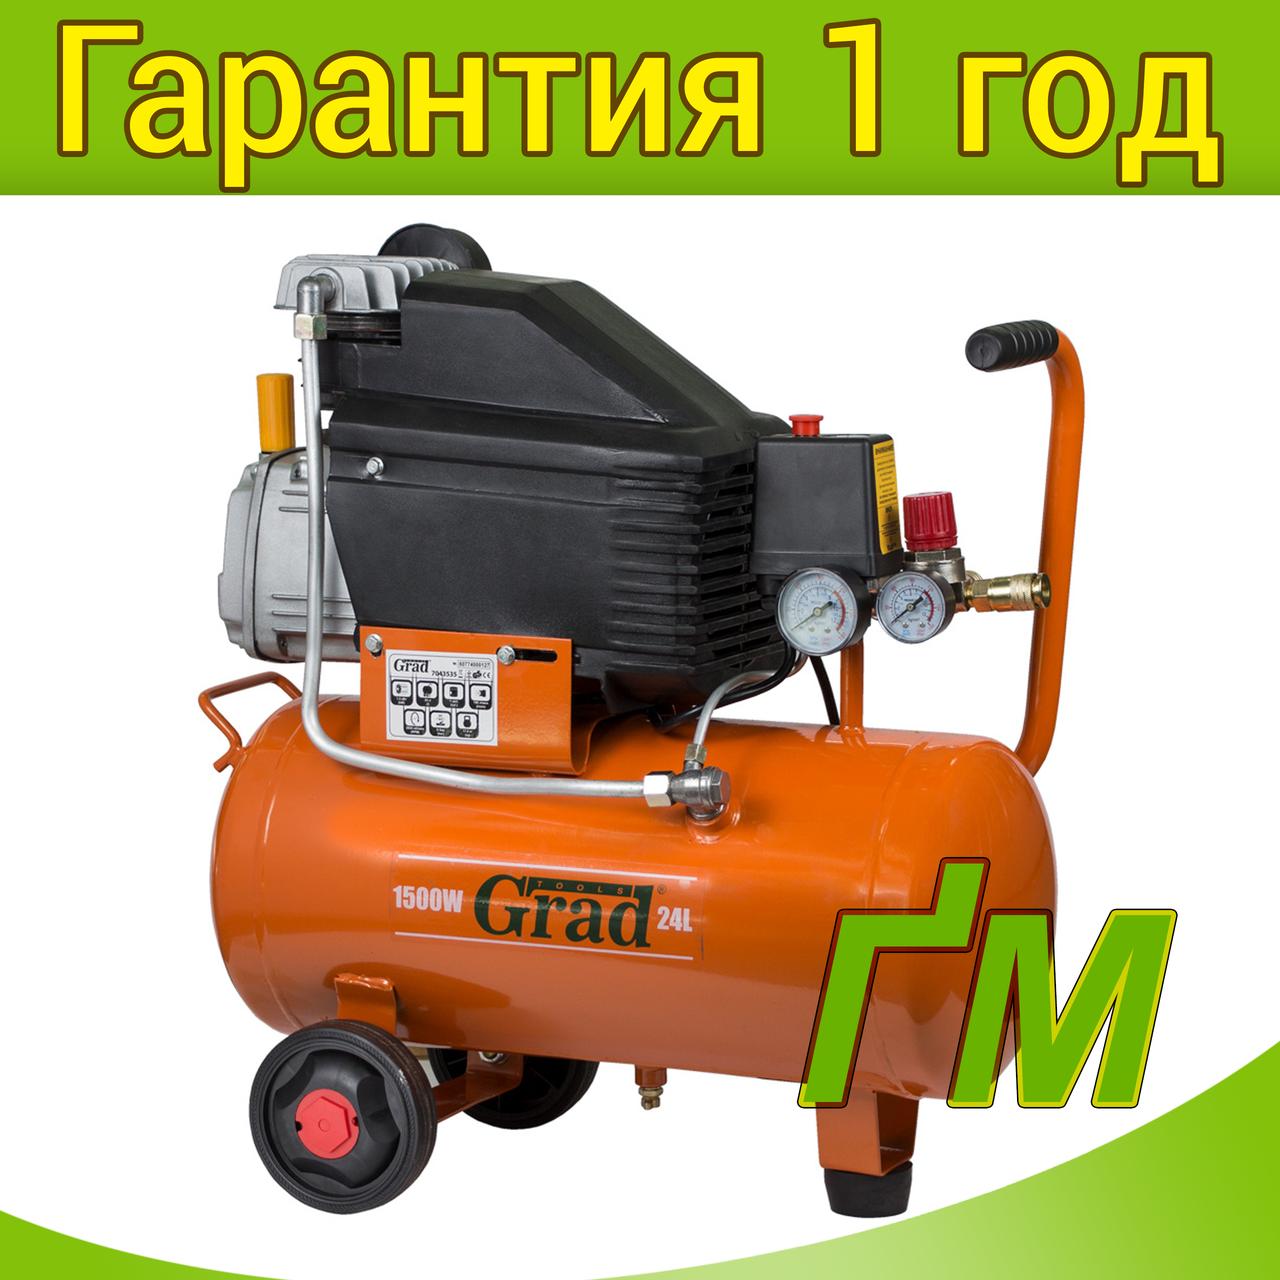 Компрессор одноцилиндровый 1.5 кВт, 198 л/мин, 8 бар, 24 л GRAD (2 крана)